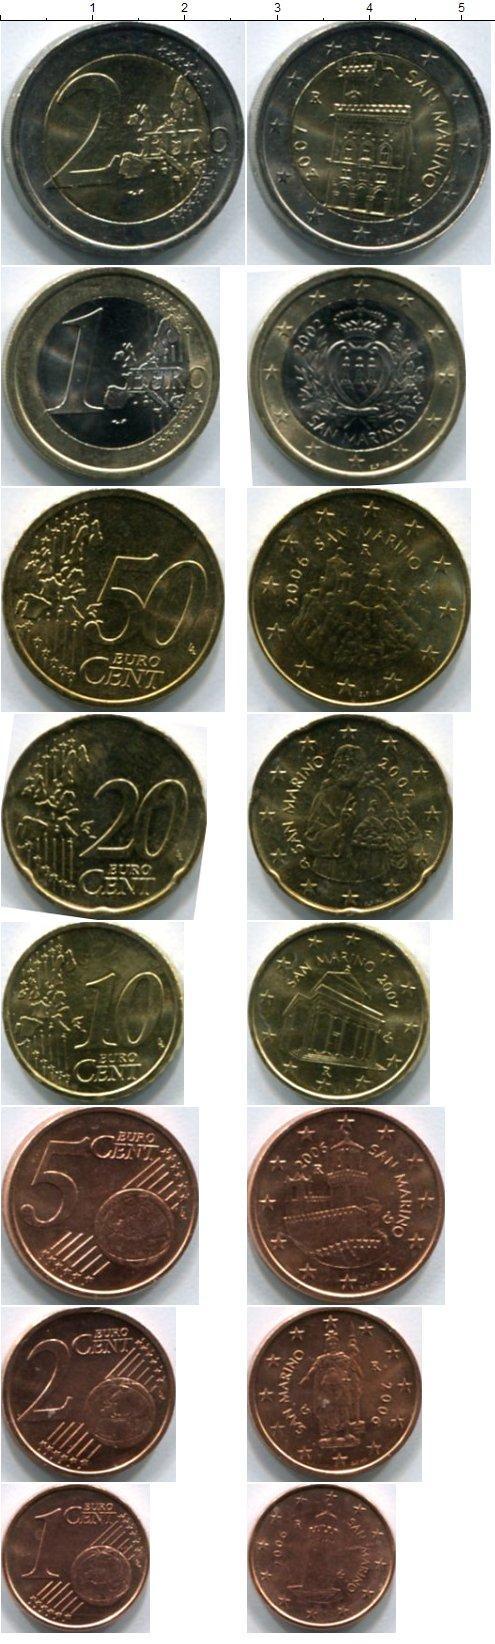 Каталог монет - Сан-Марино Сан-Марино 2006-2007